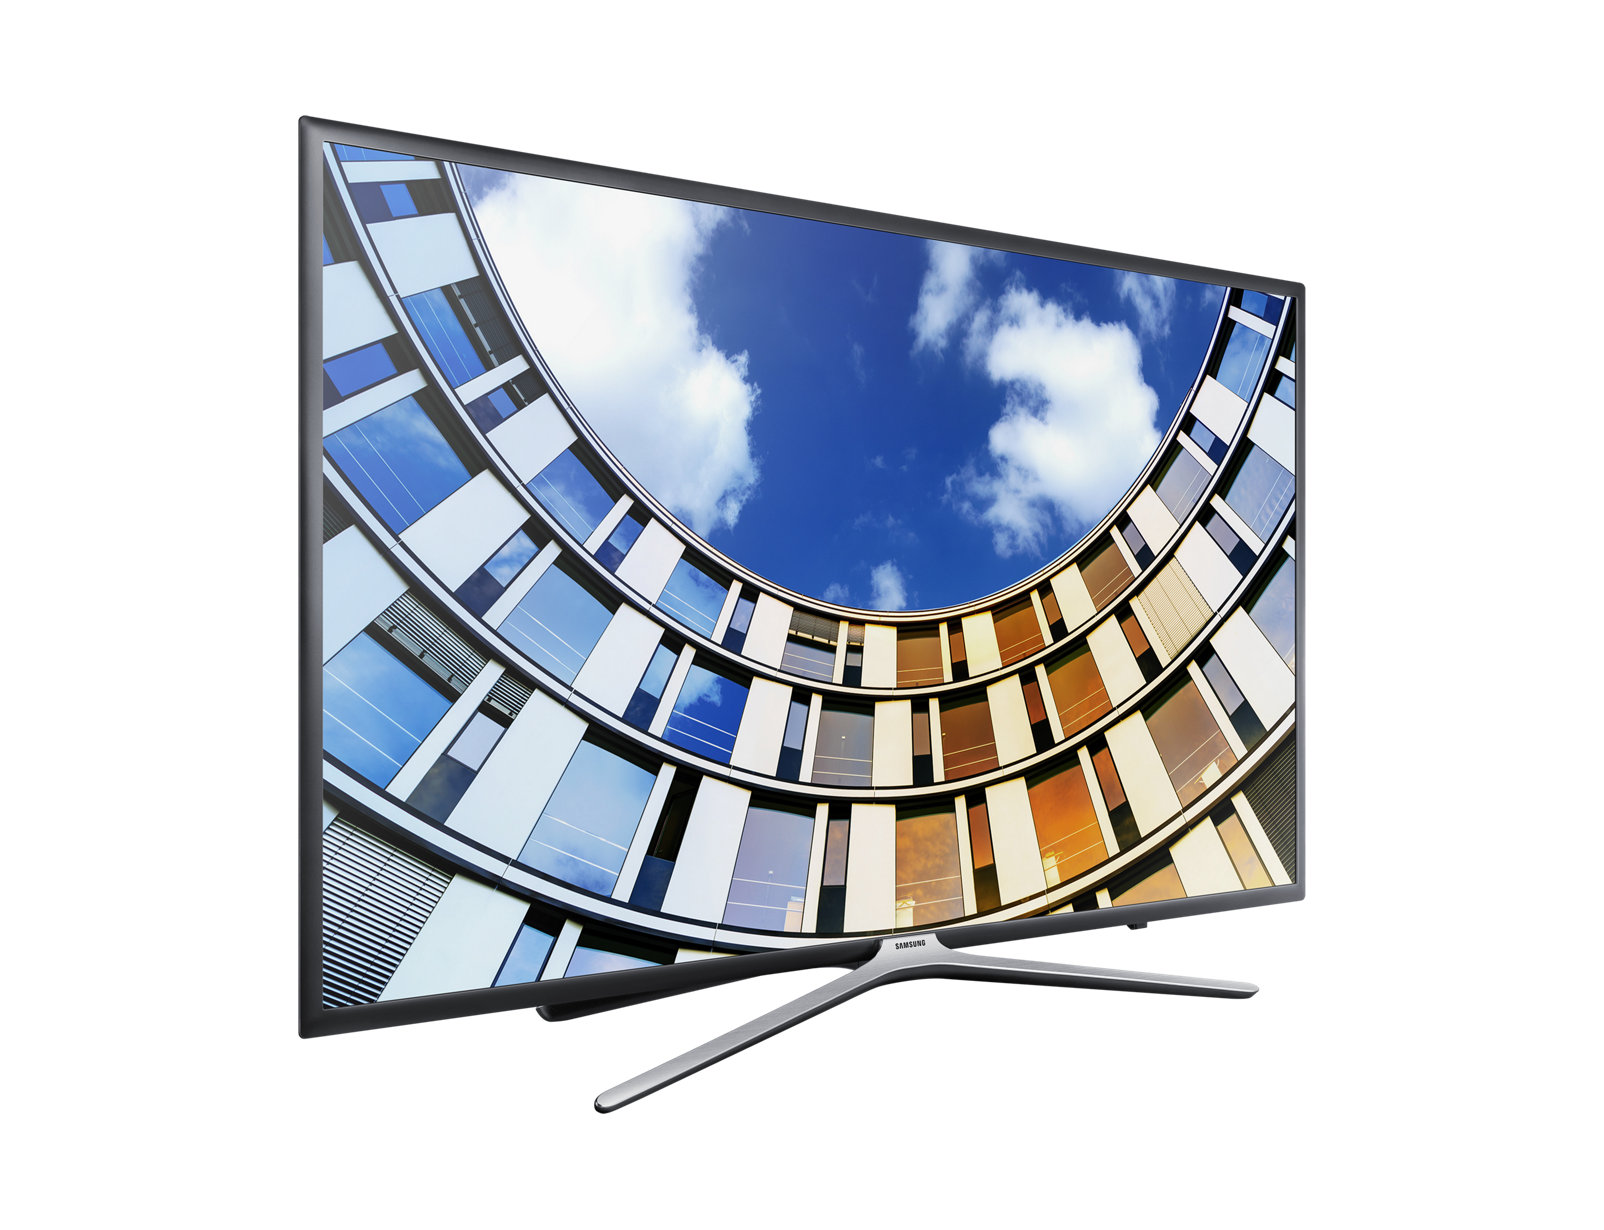 TELEWIZOR LED SAMSUNG 40'' UE40K5579 SMART TV FHD